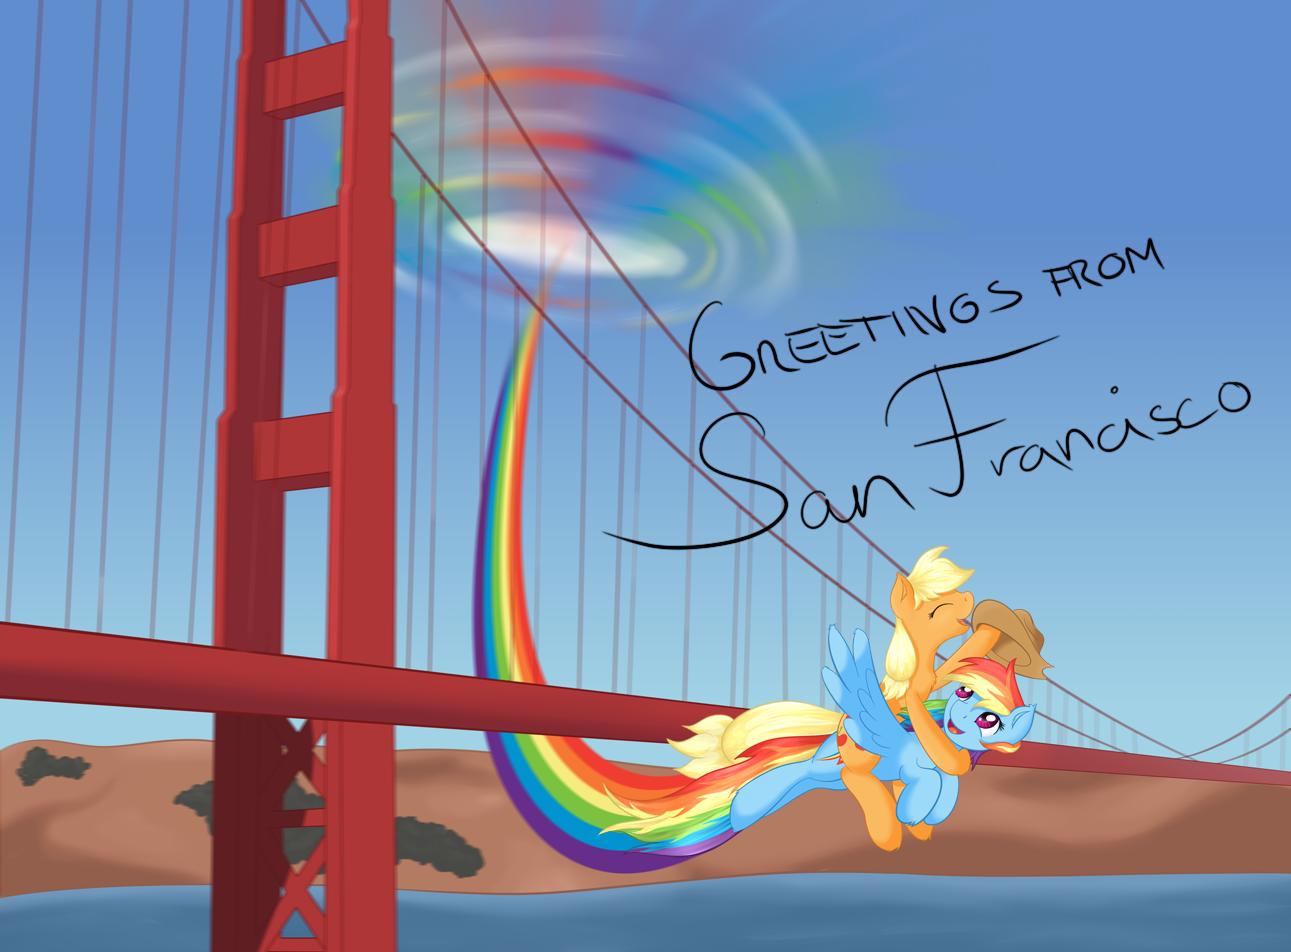 Greetings from san francisco my little pony friendship is magic san francisco rainbow dash sky m4hsunfo